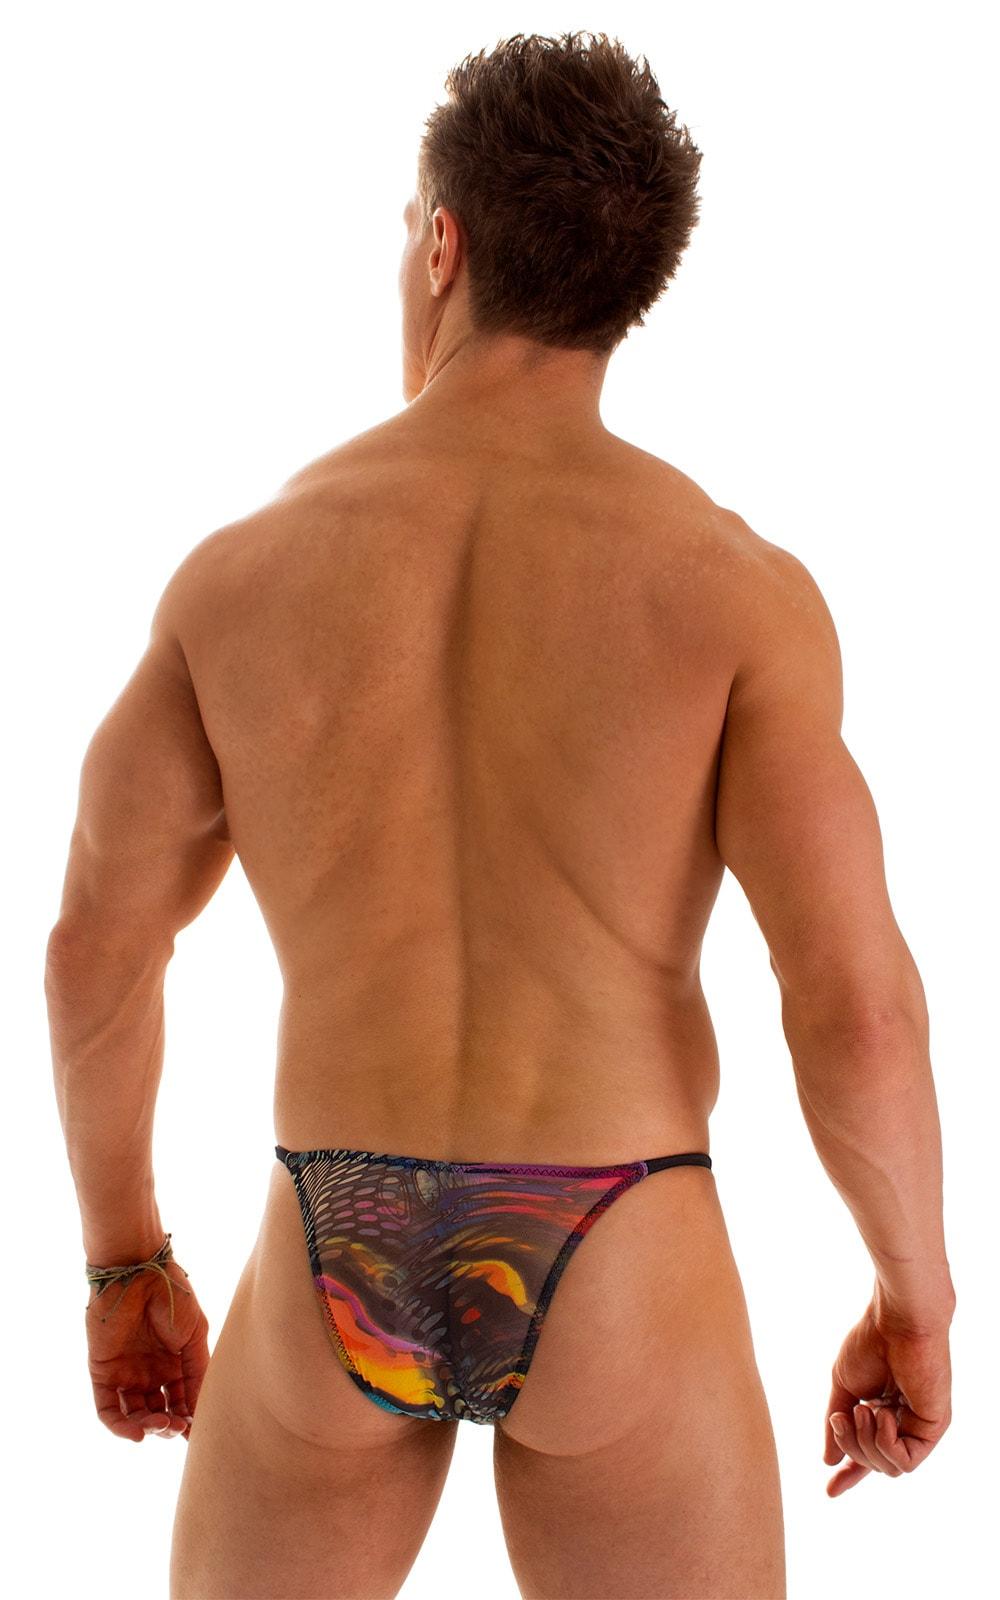 Sunseeker2 Tanning Swimsuit in Semi Sheer Aquarious Print on mesh 2